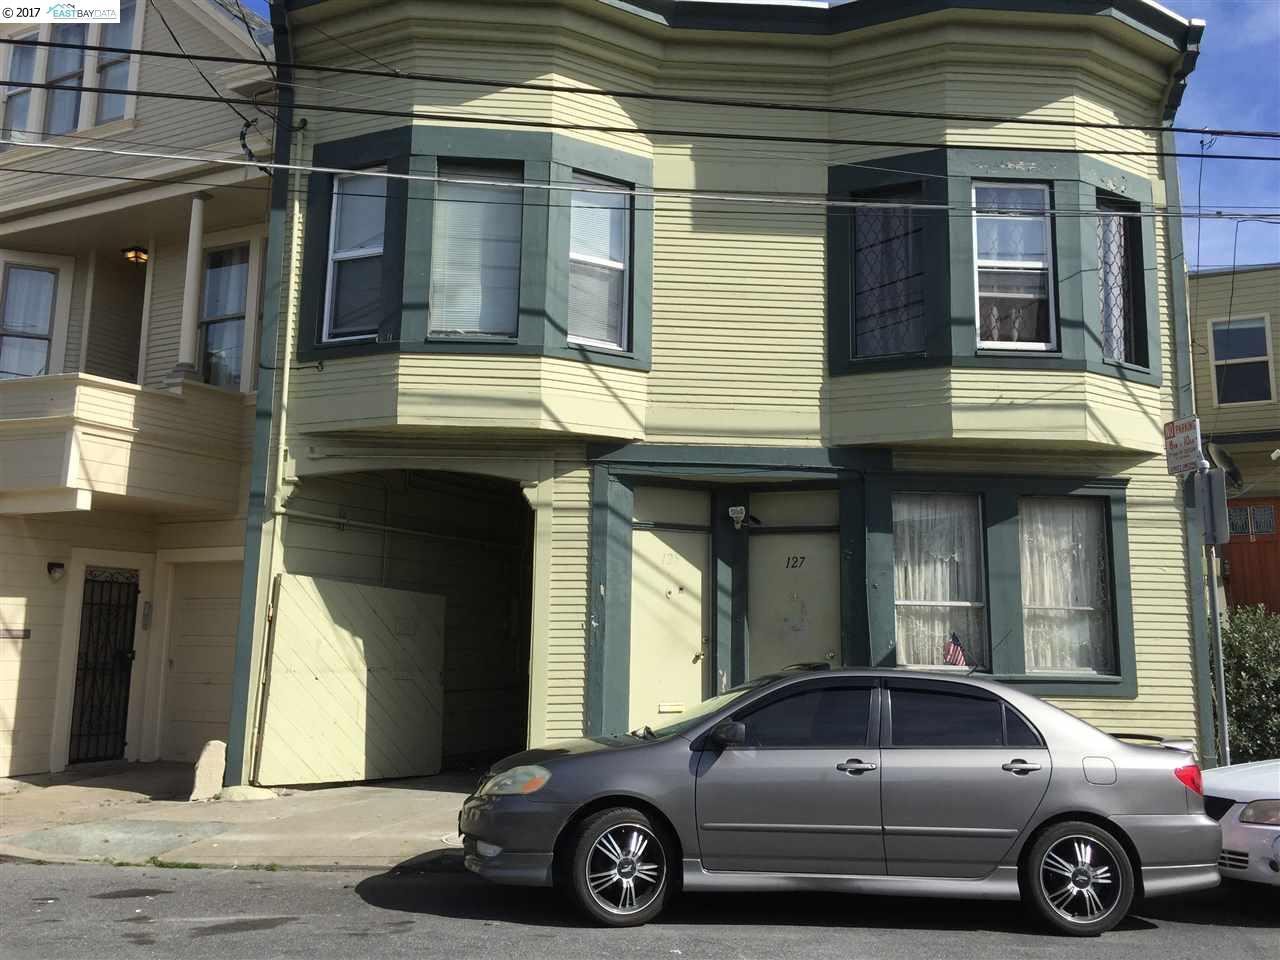 125 Leese St, San Francisco CA 94110 - Photo 1